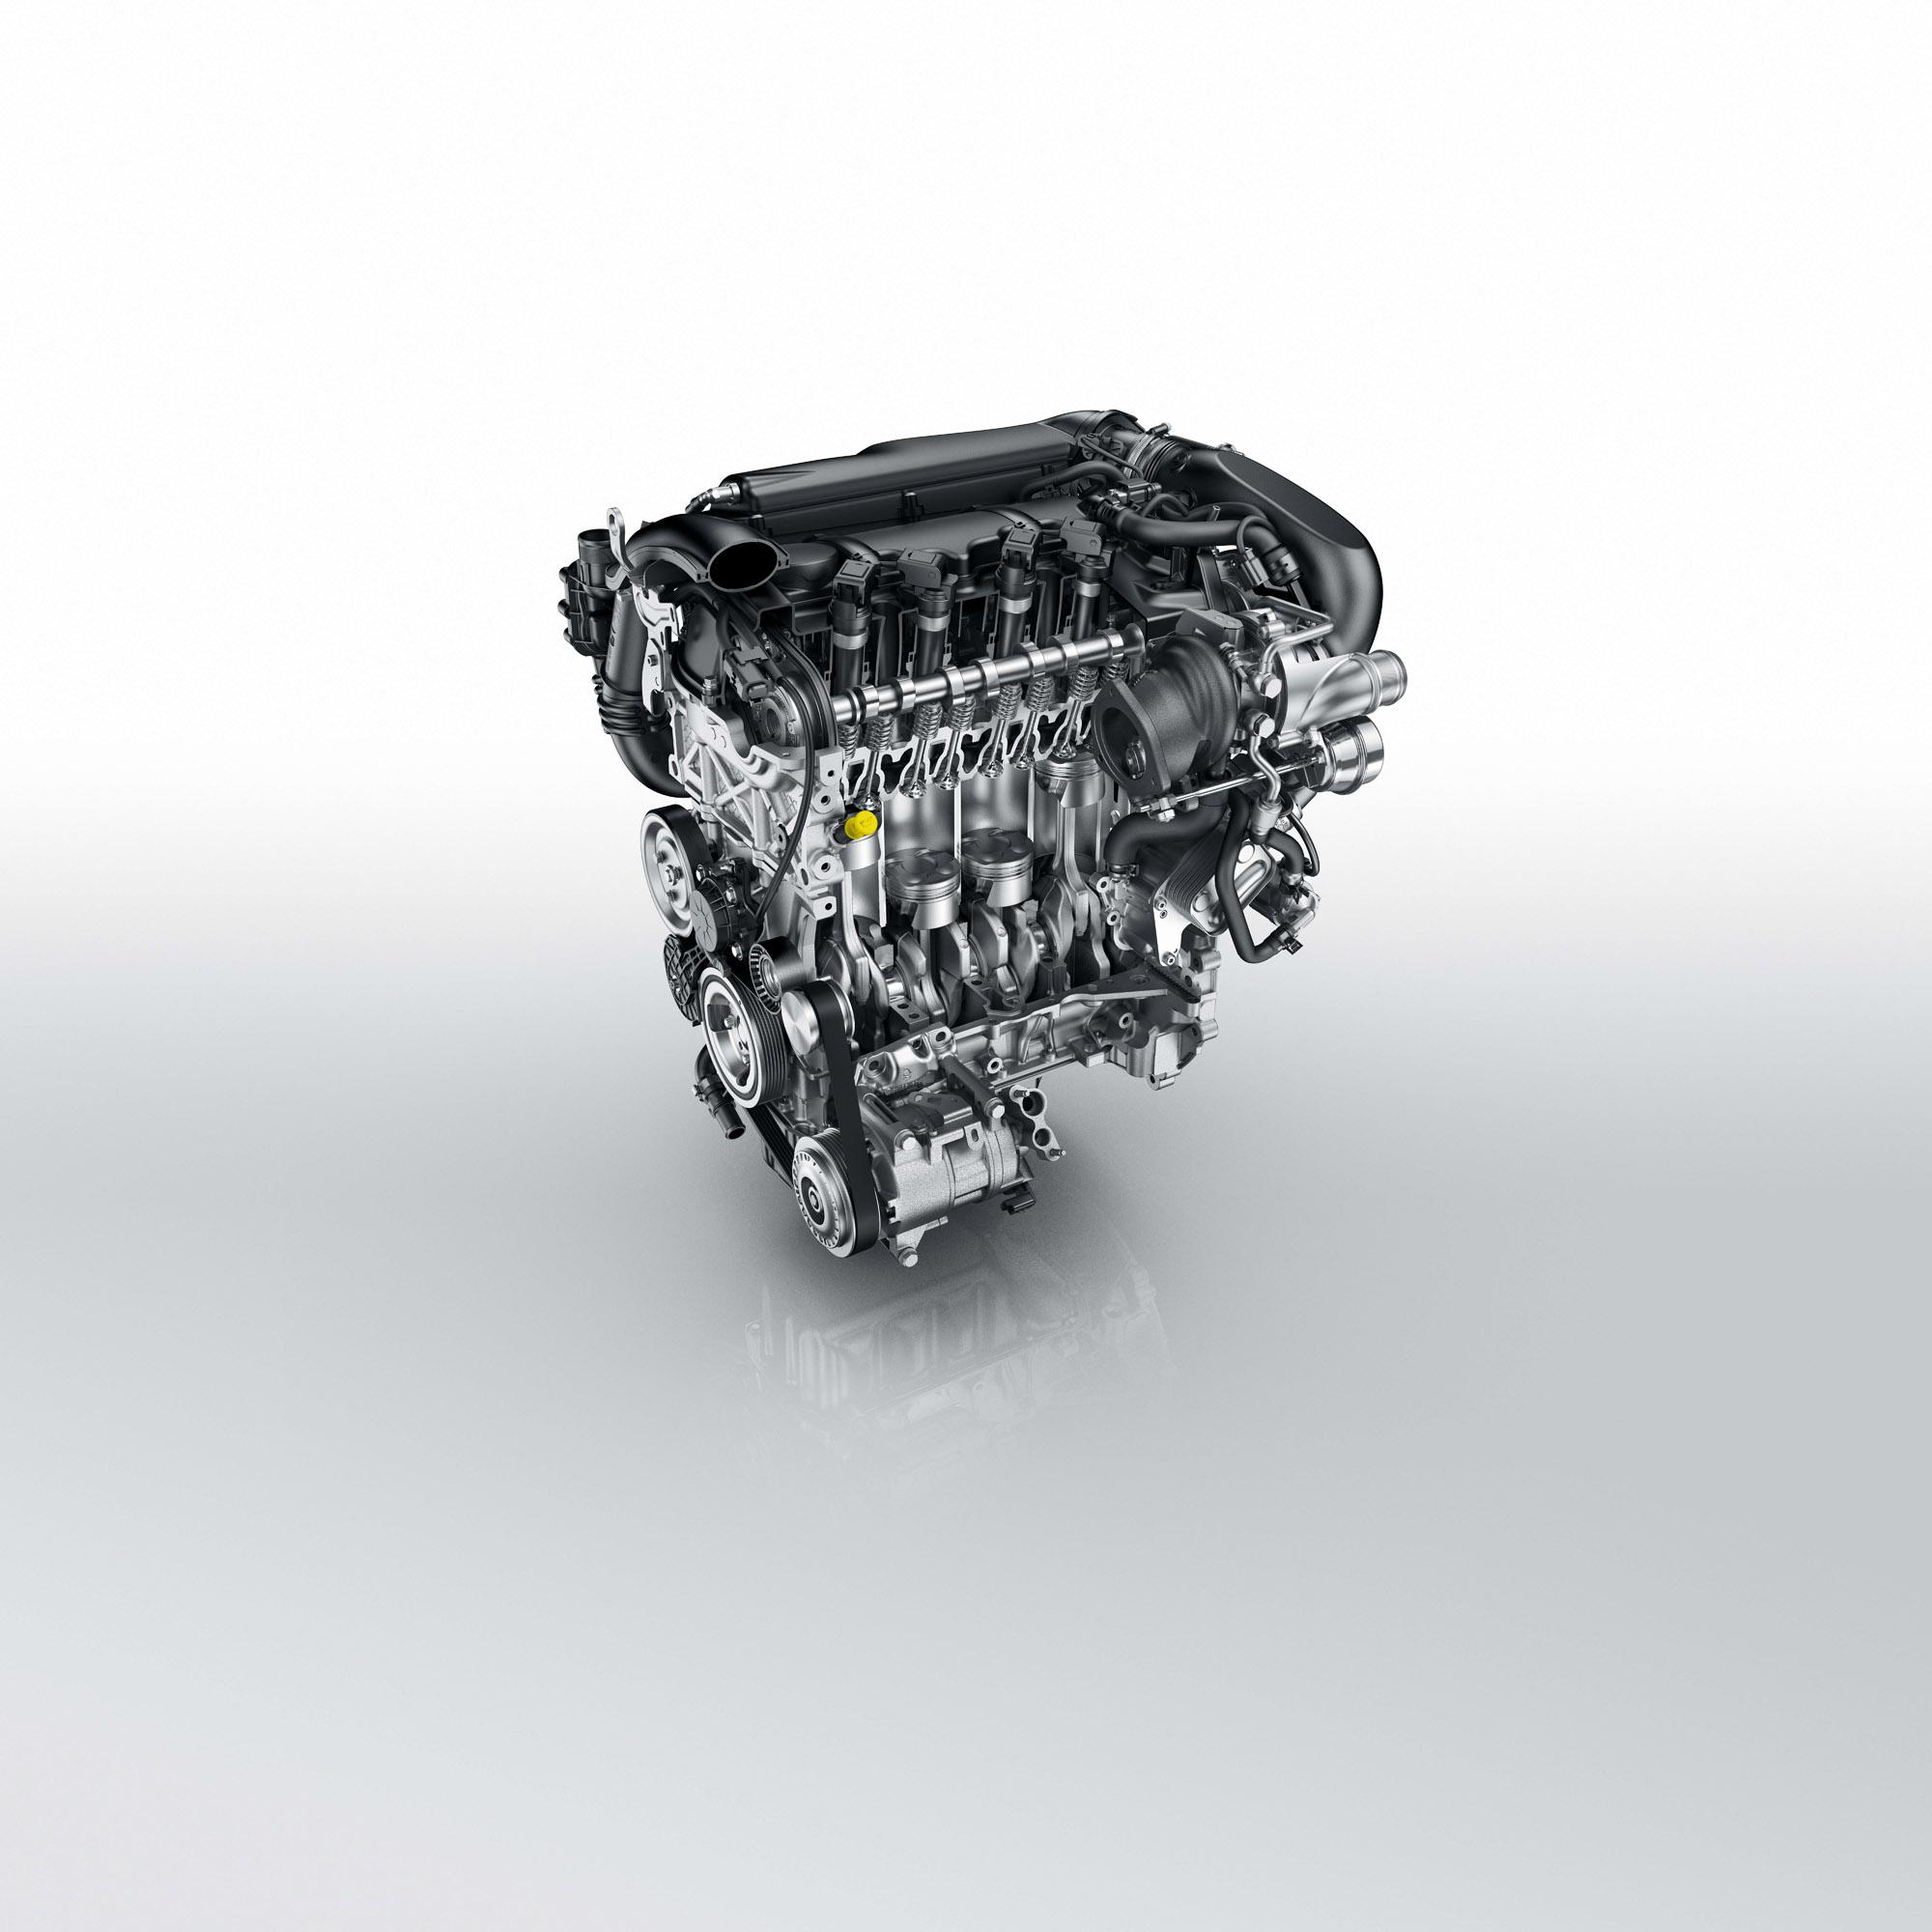 New Euro 6 Eco Friendly Peugeot Engines